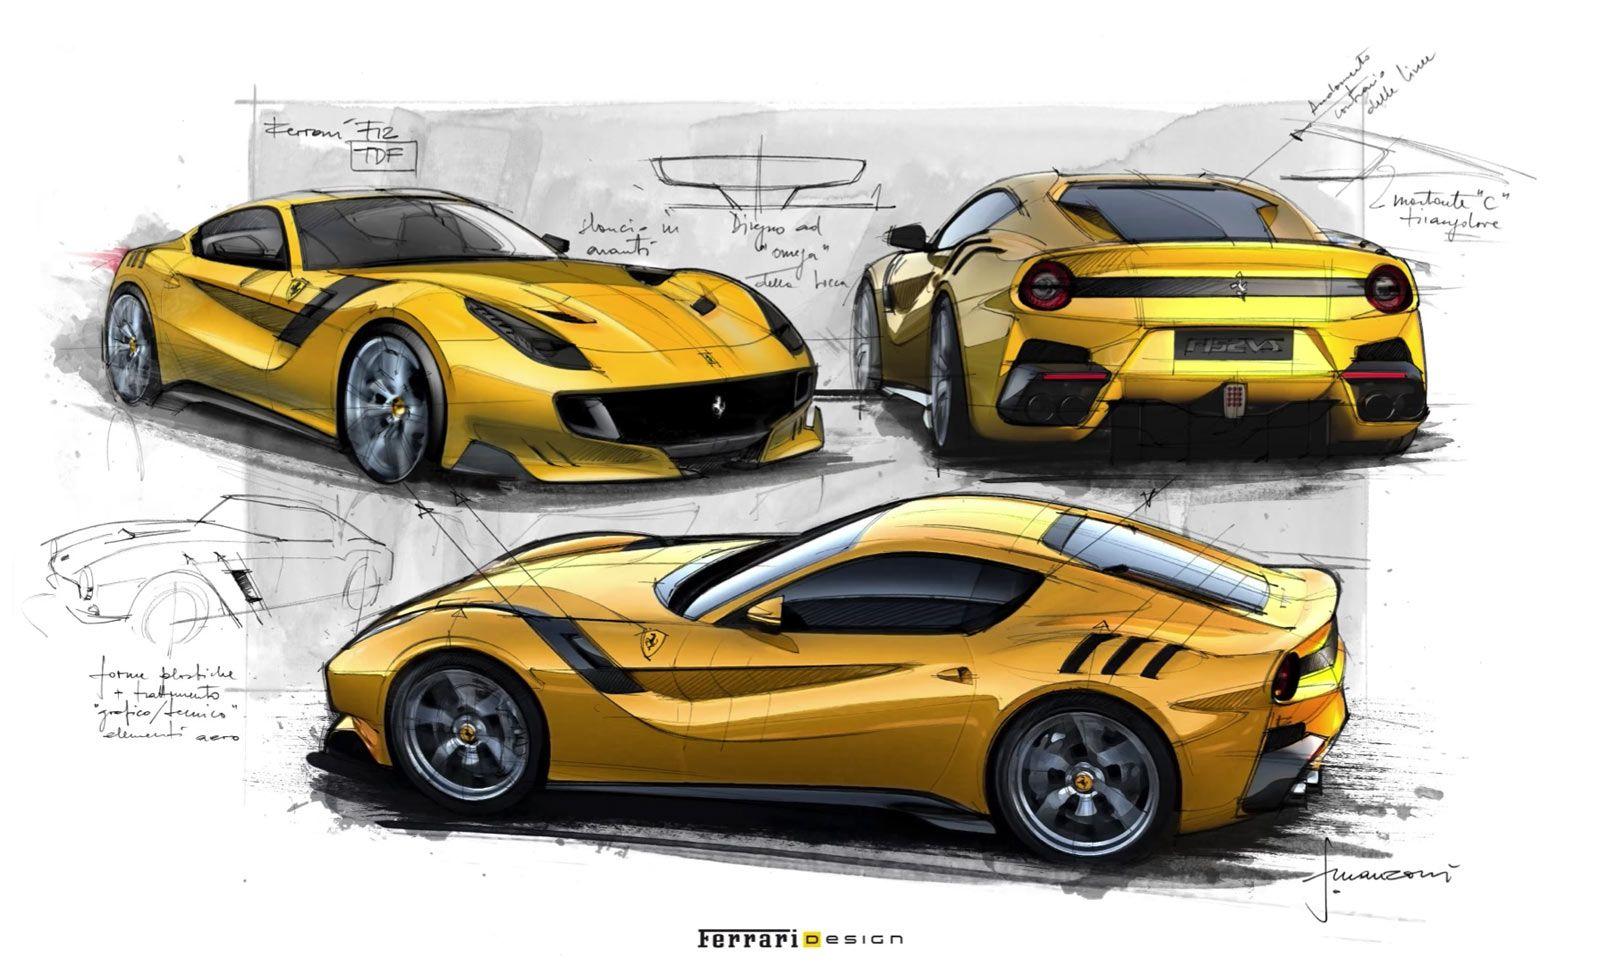 Ferrari F12tdf Design Sketches By Flavio Manzoni Sketch Bolpoin Standard R8